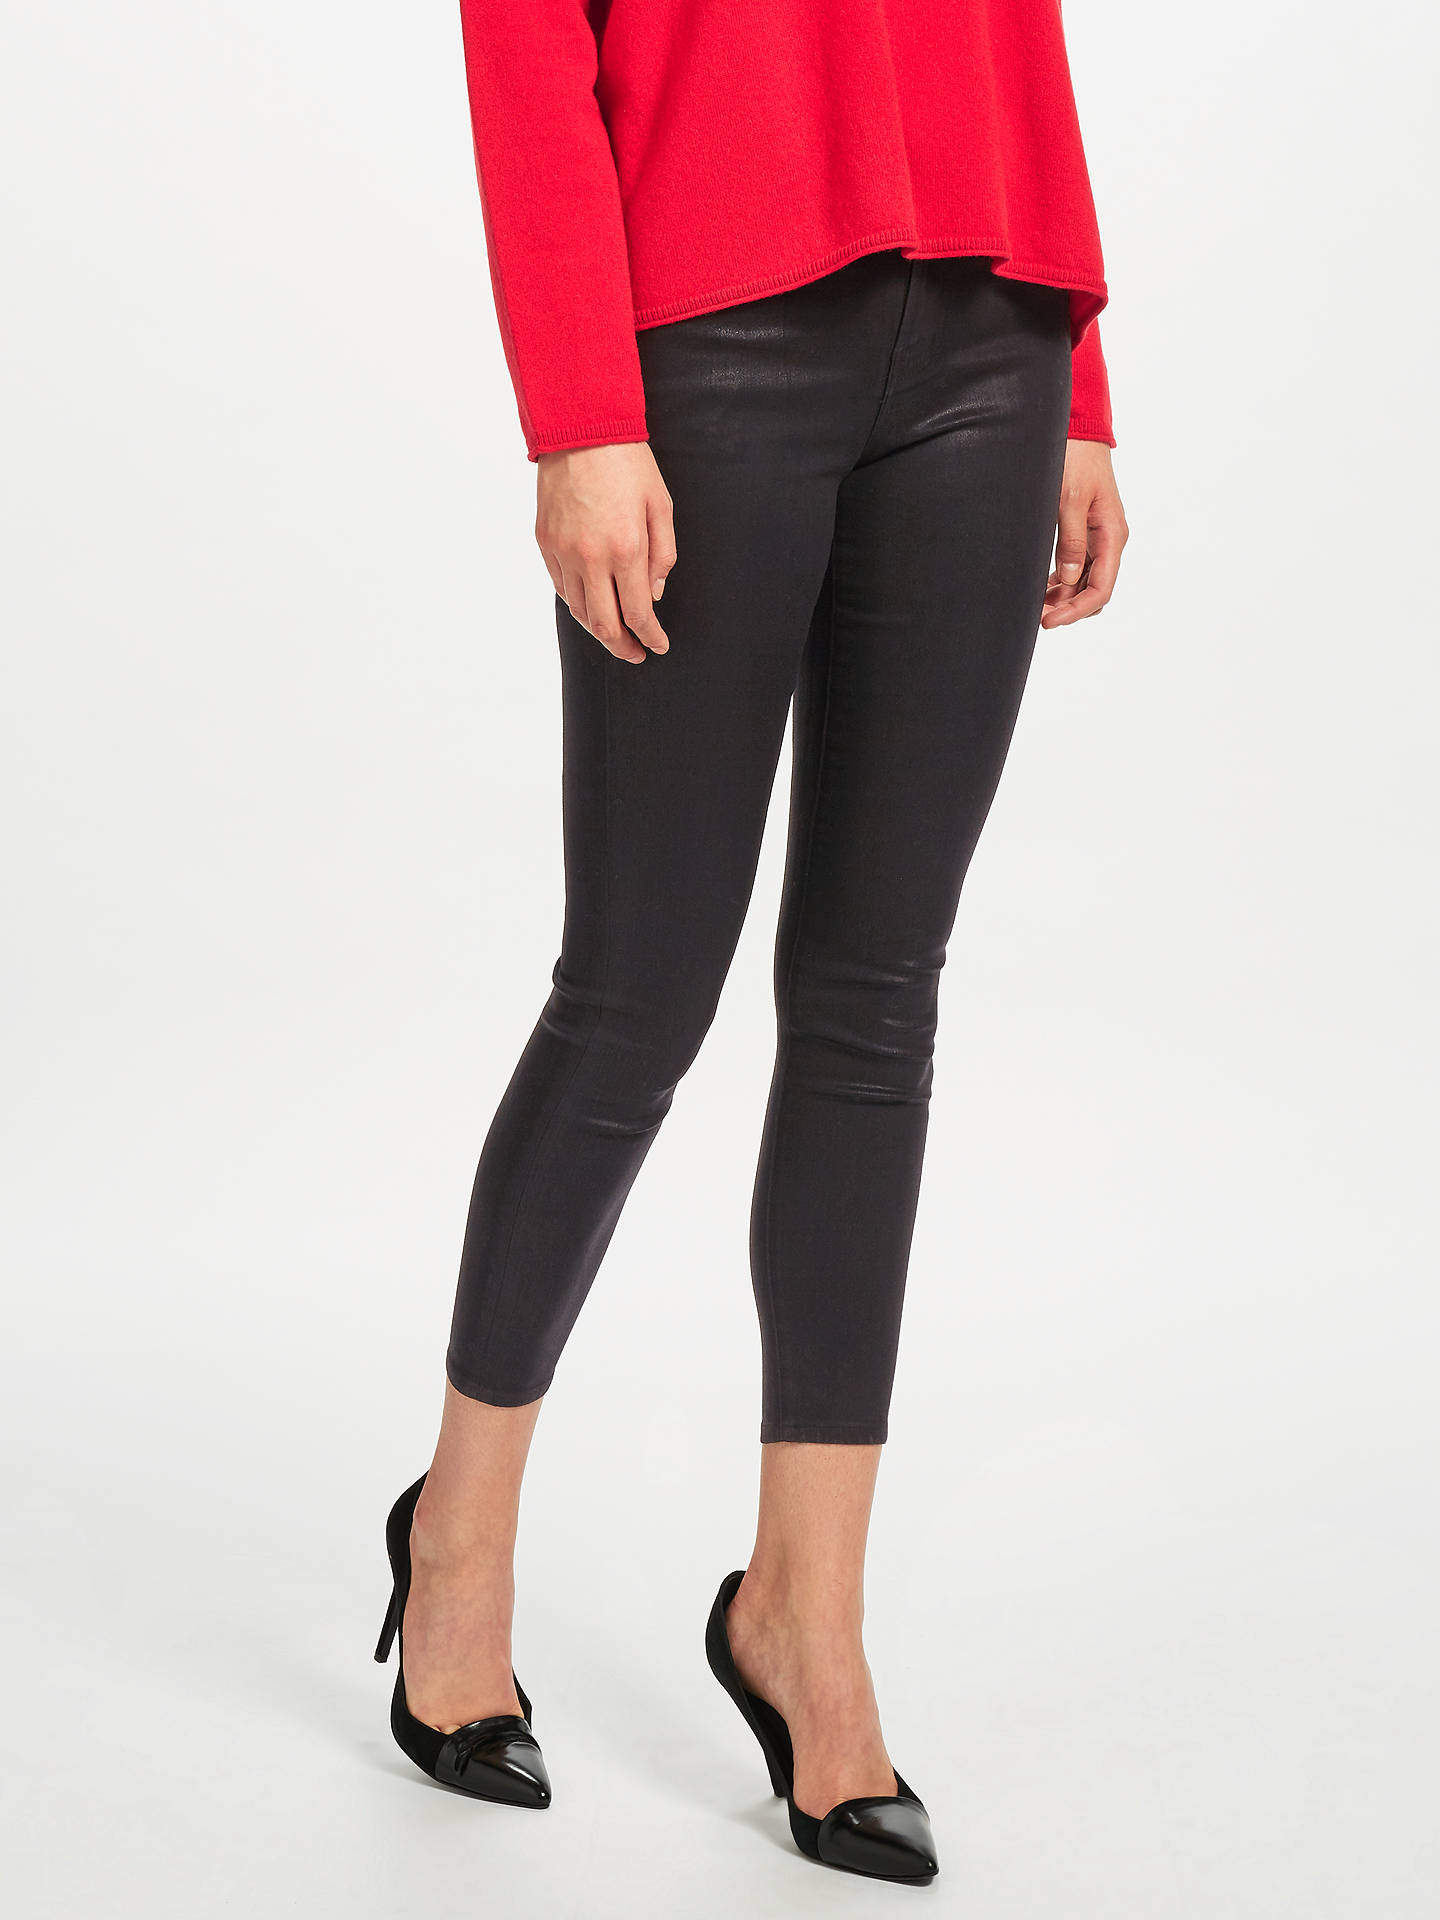 454666b1d210 Buy J Brand Alana High Rise Cropped Skinny Jeans